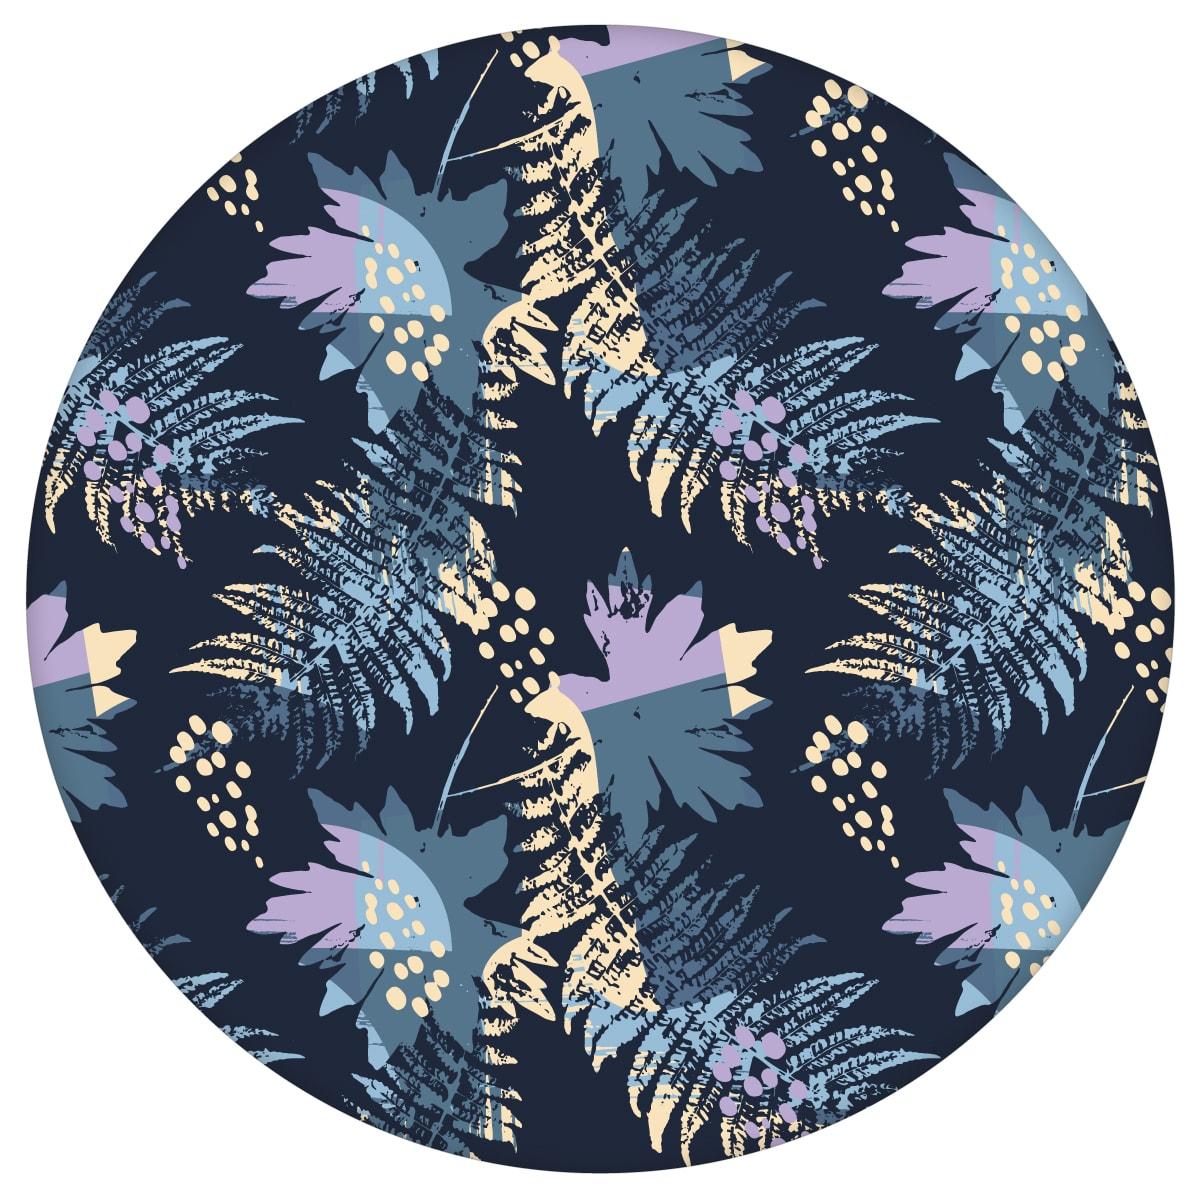 Dunkelblaue Blumentapete Wildflowers im Retro Look, florale Tapete als Wandgestaltung